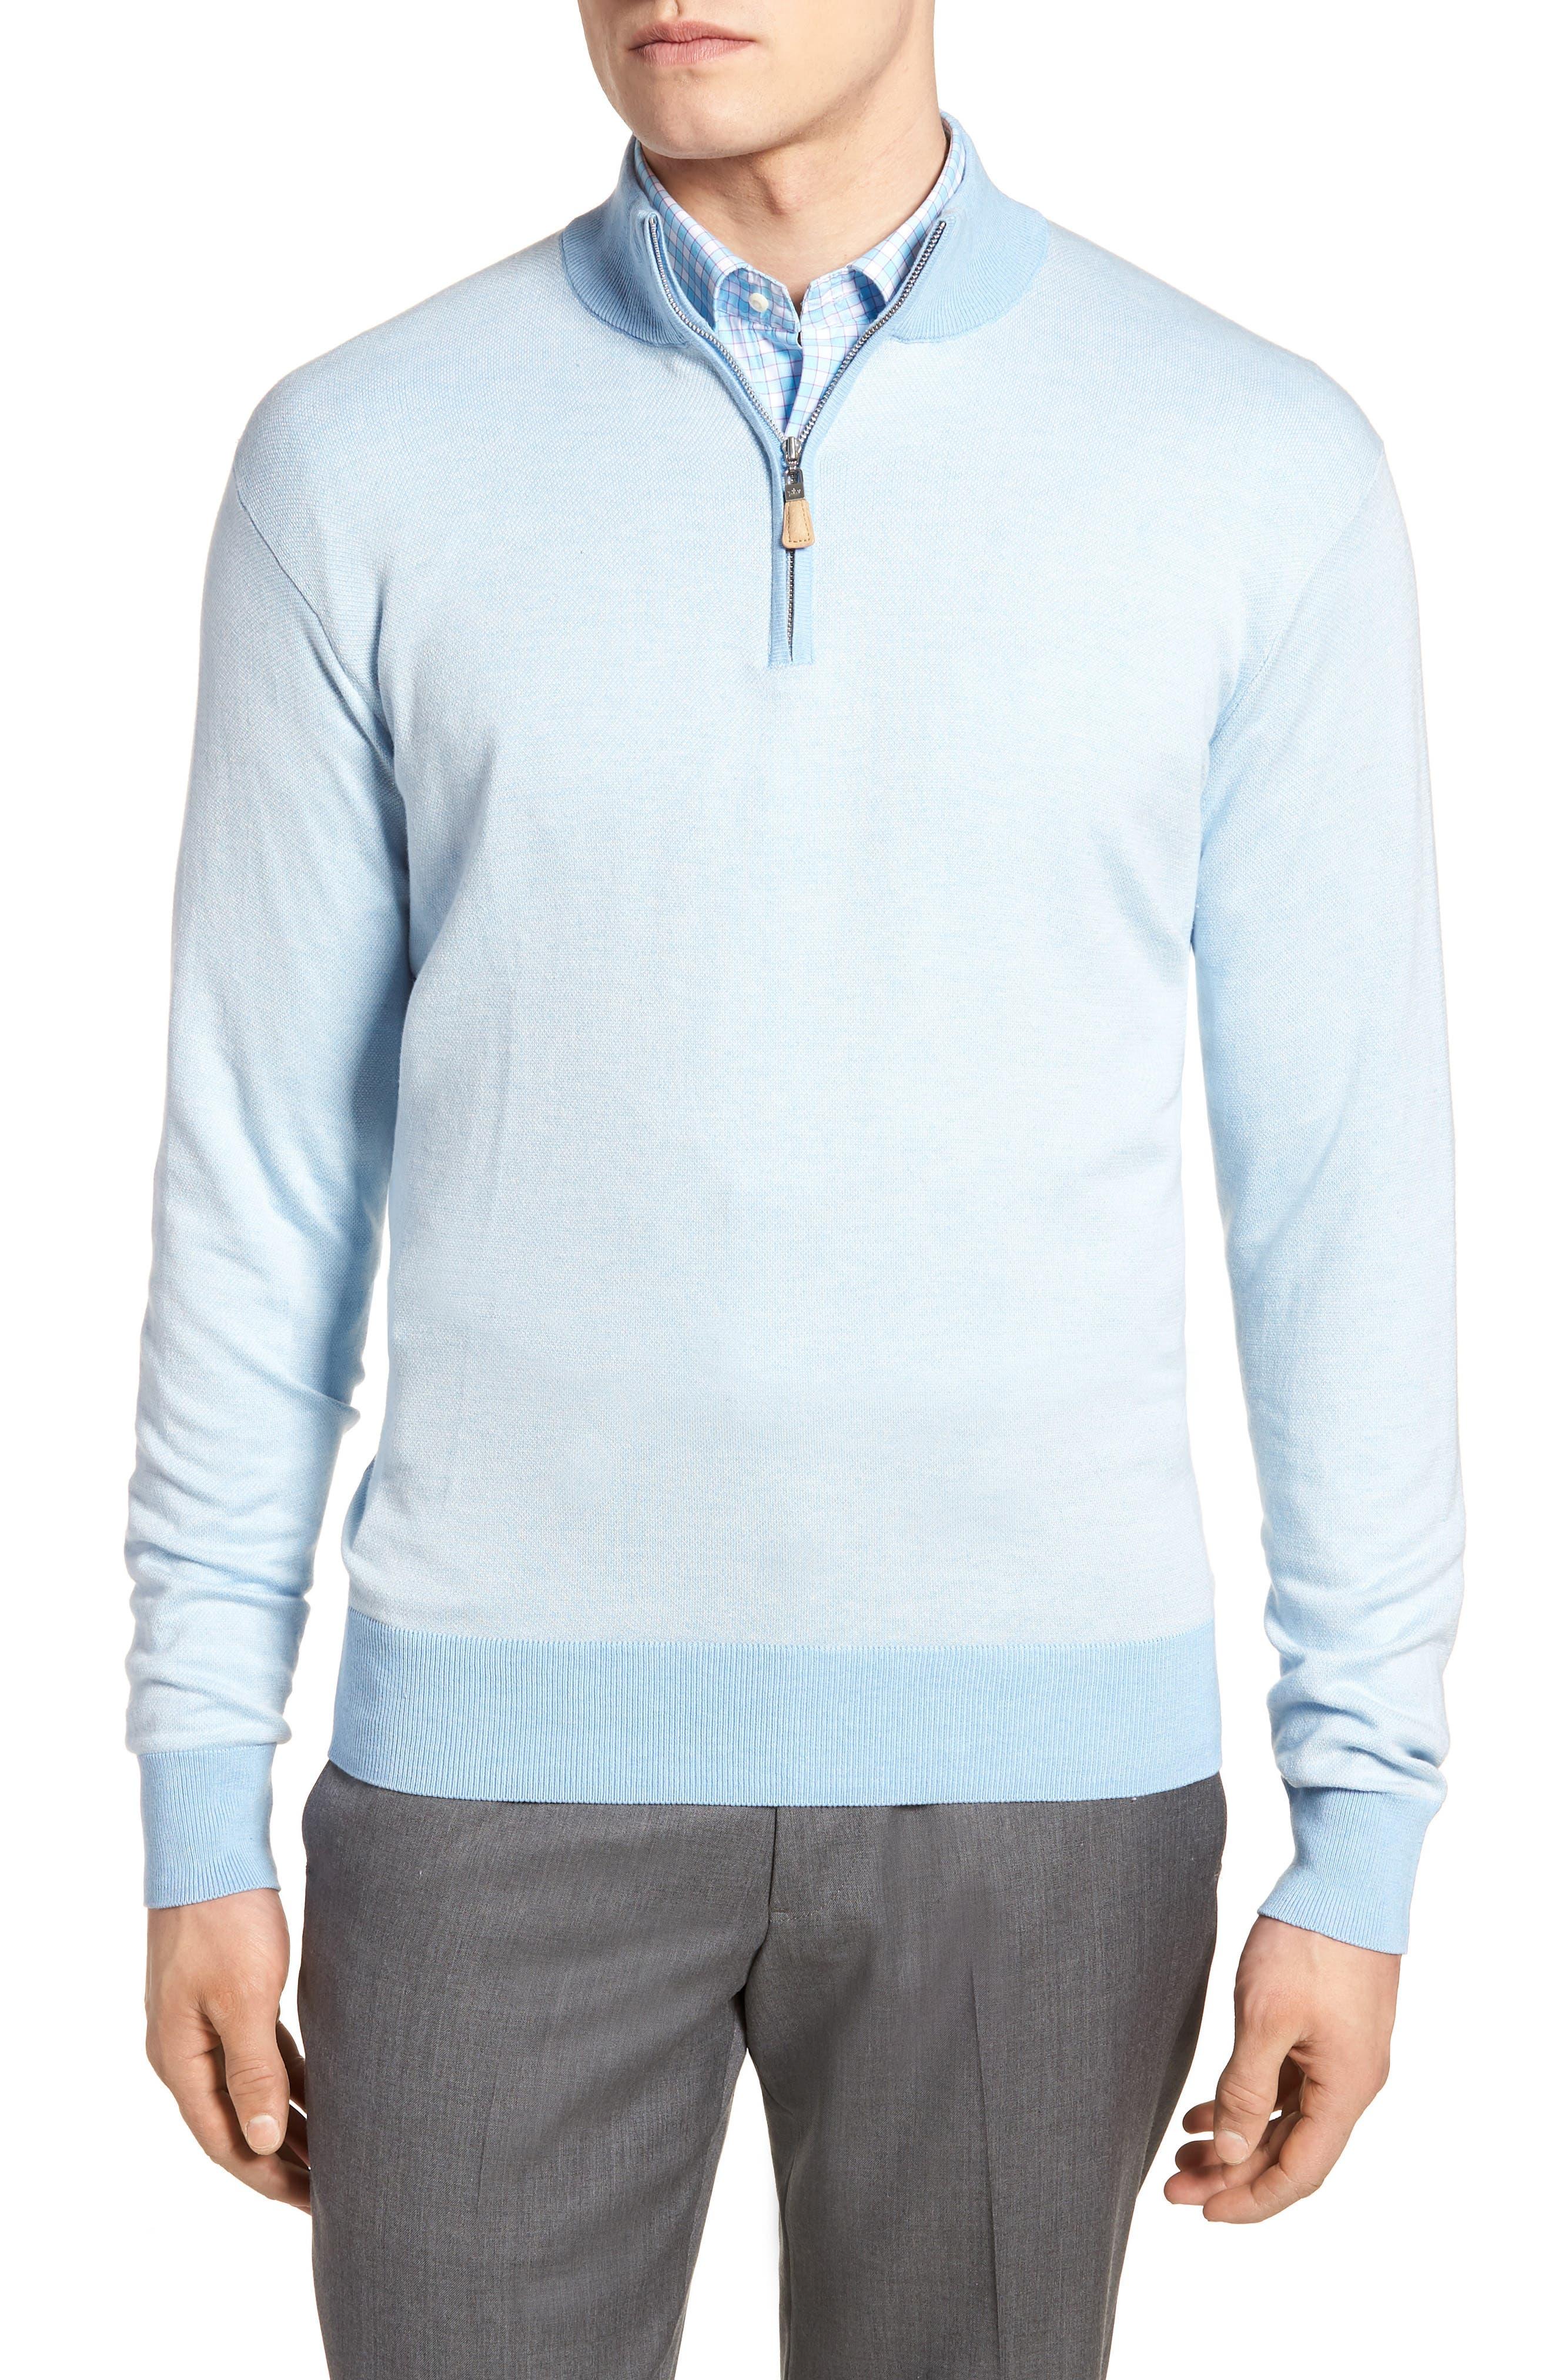 Crown Bird's Eye Cotton & Silk Quarter Zip Sweater,                             Main thumbnail 1, color,                             Tarheel Blue